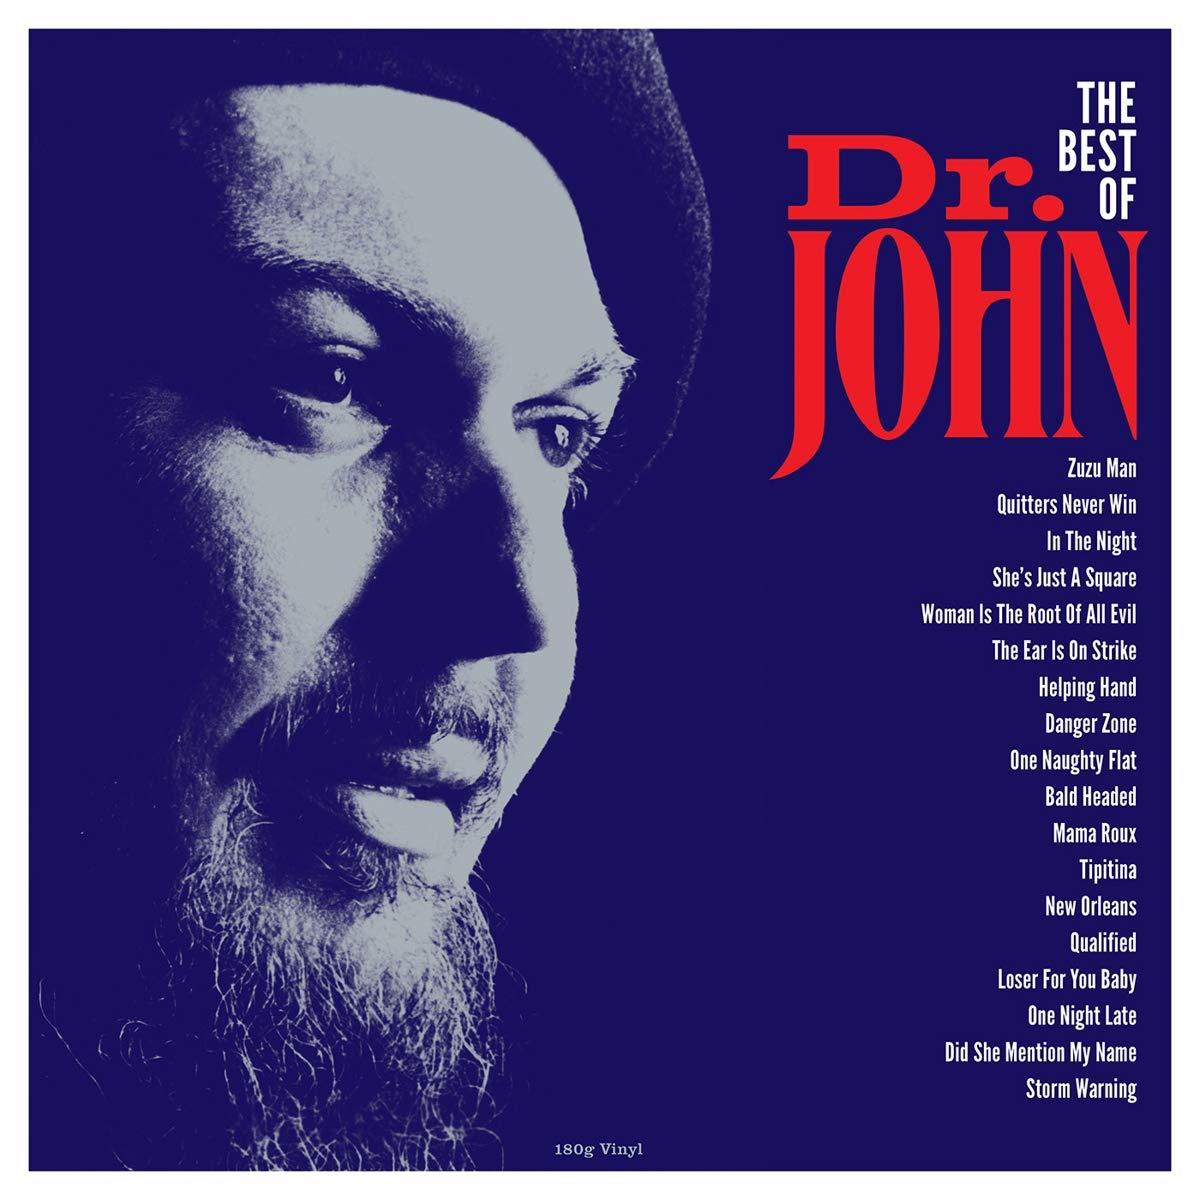 The Best Of Dr. John [180g Vinyl LP] [VINYL] £6.25 (Prime) £9.24 (Non Prime) @ Amazon